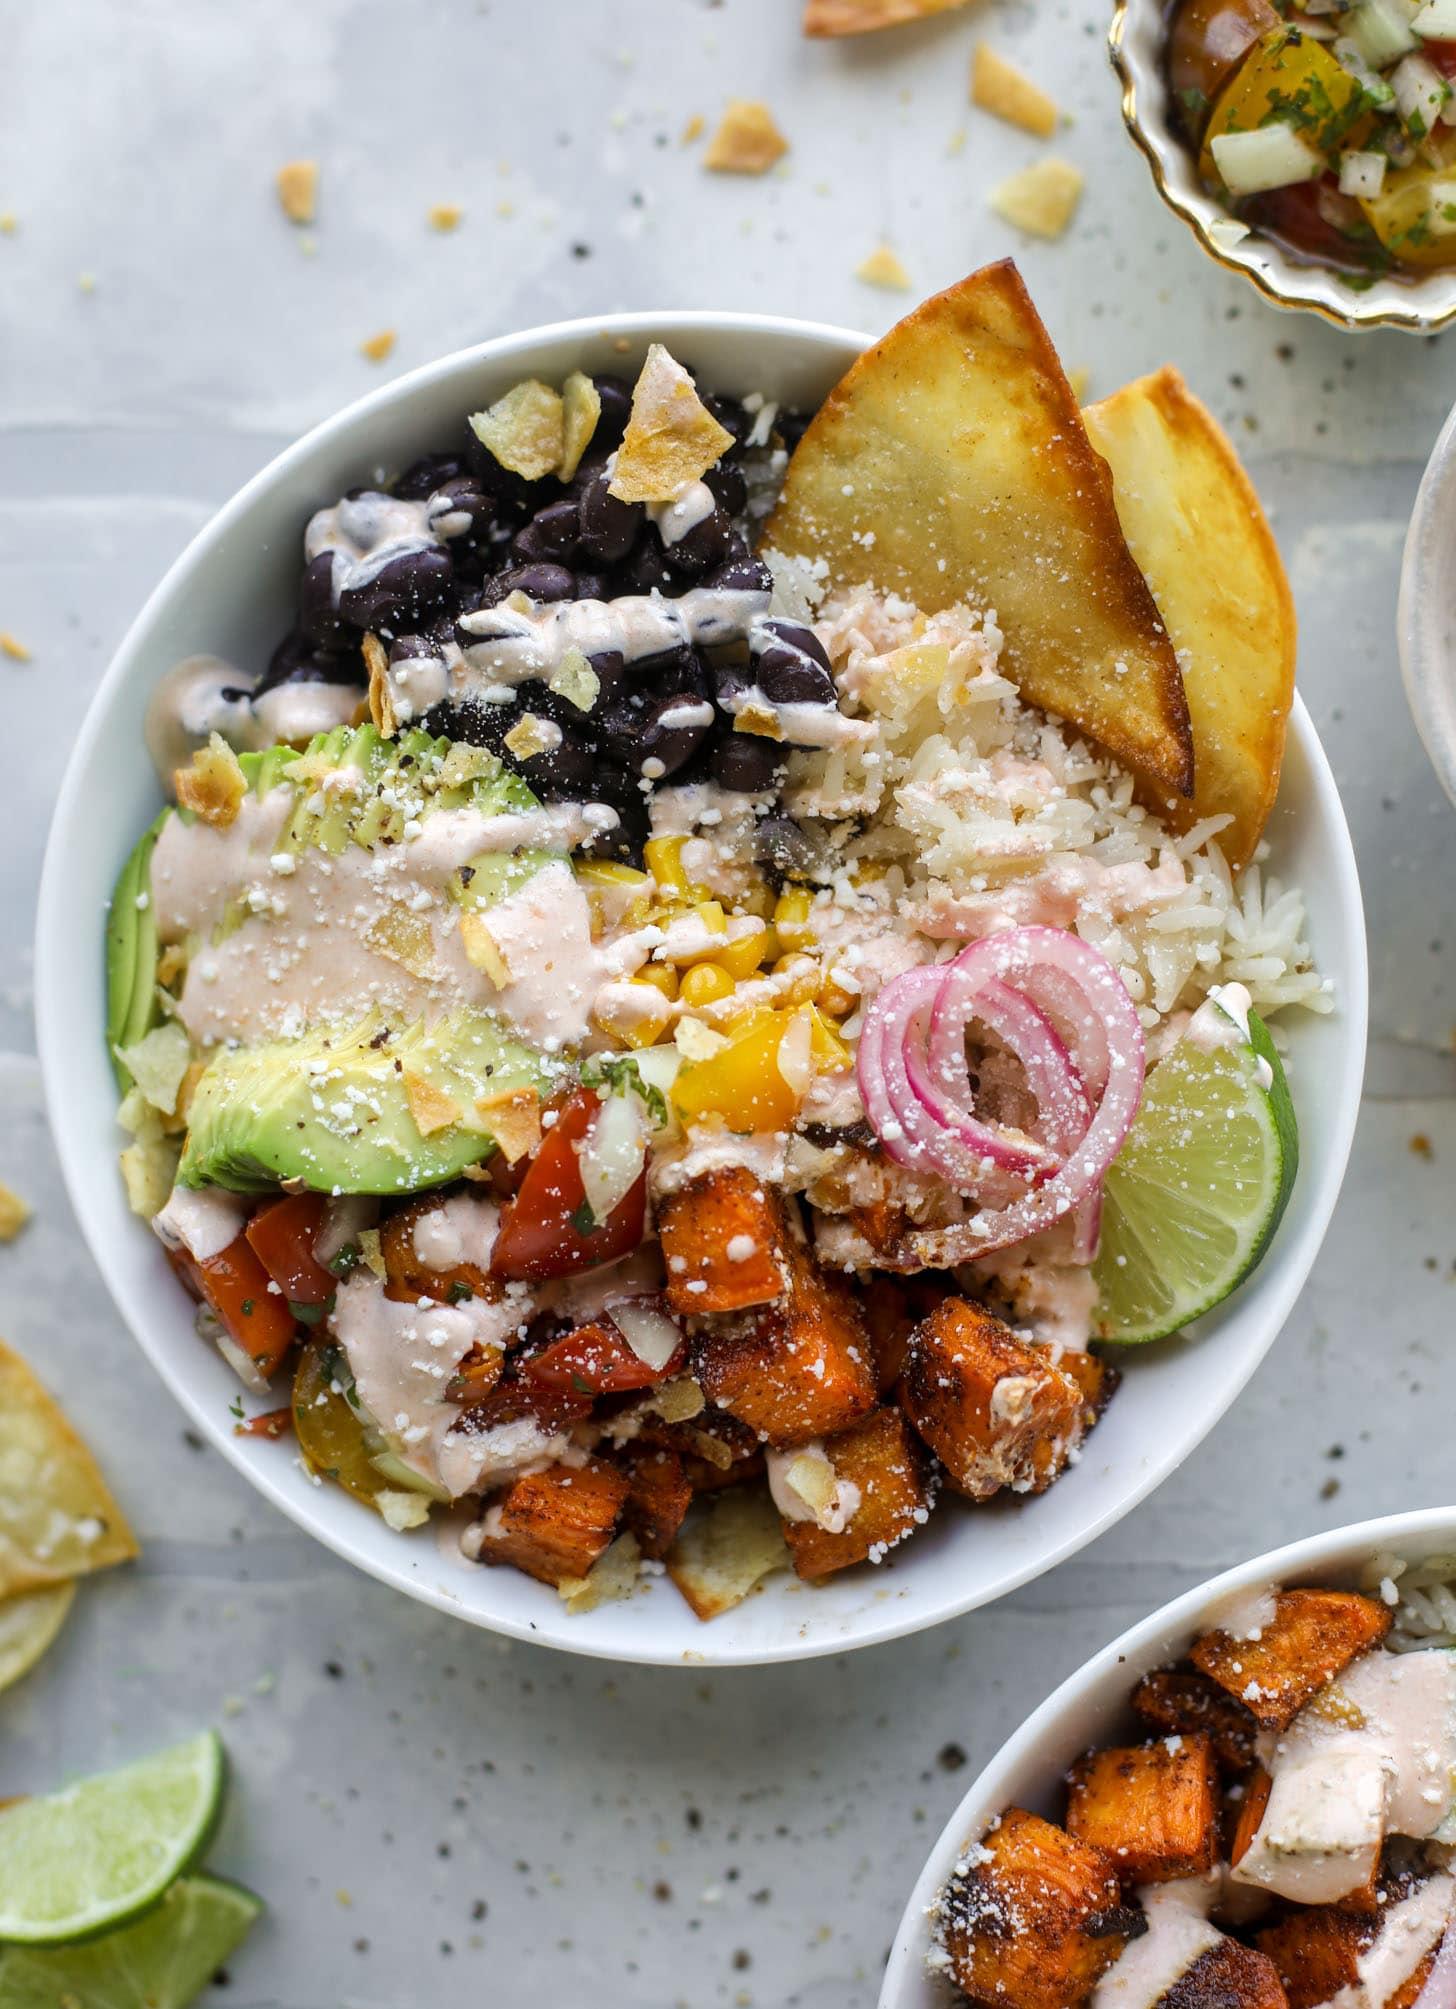 chili lime sweet potato taco bowls